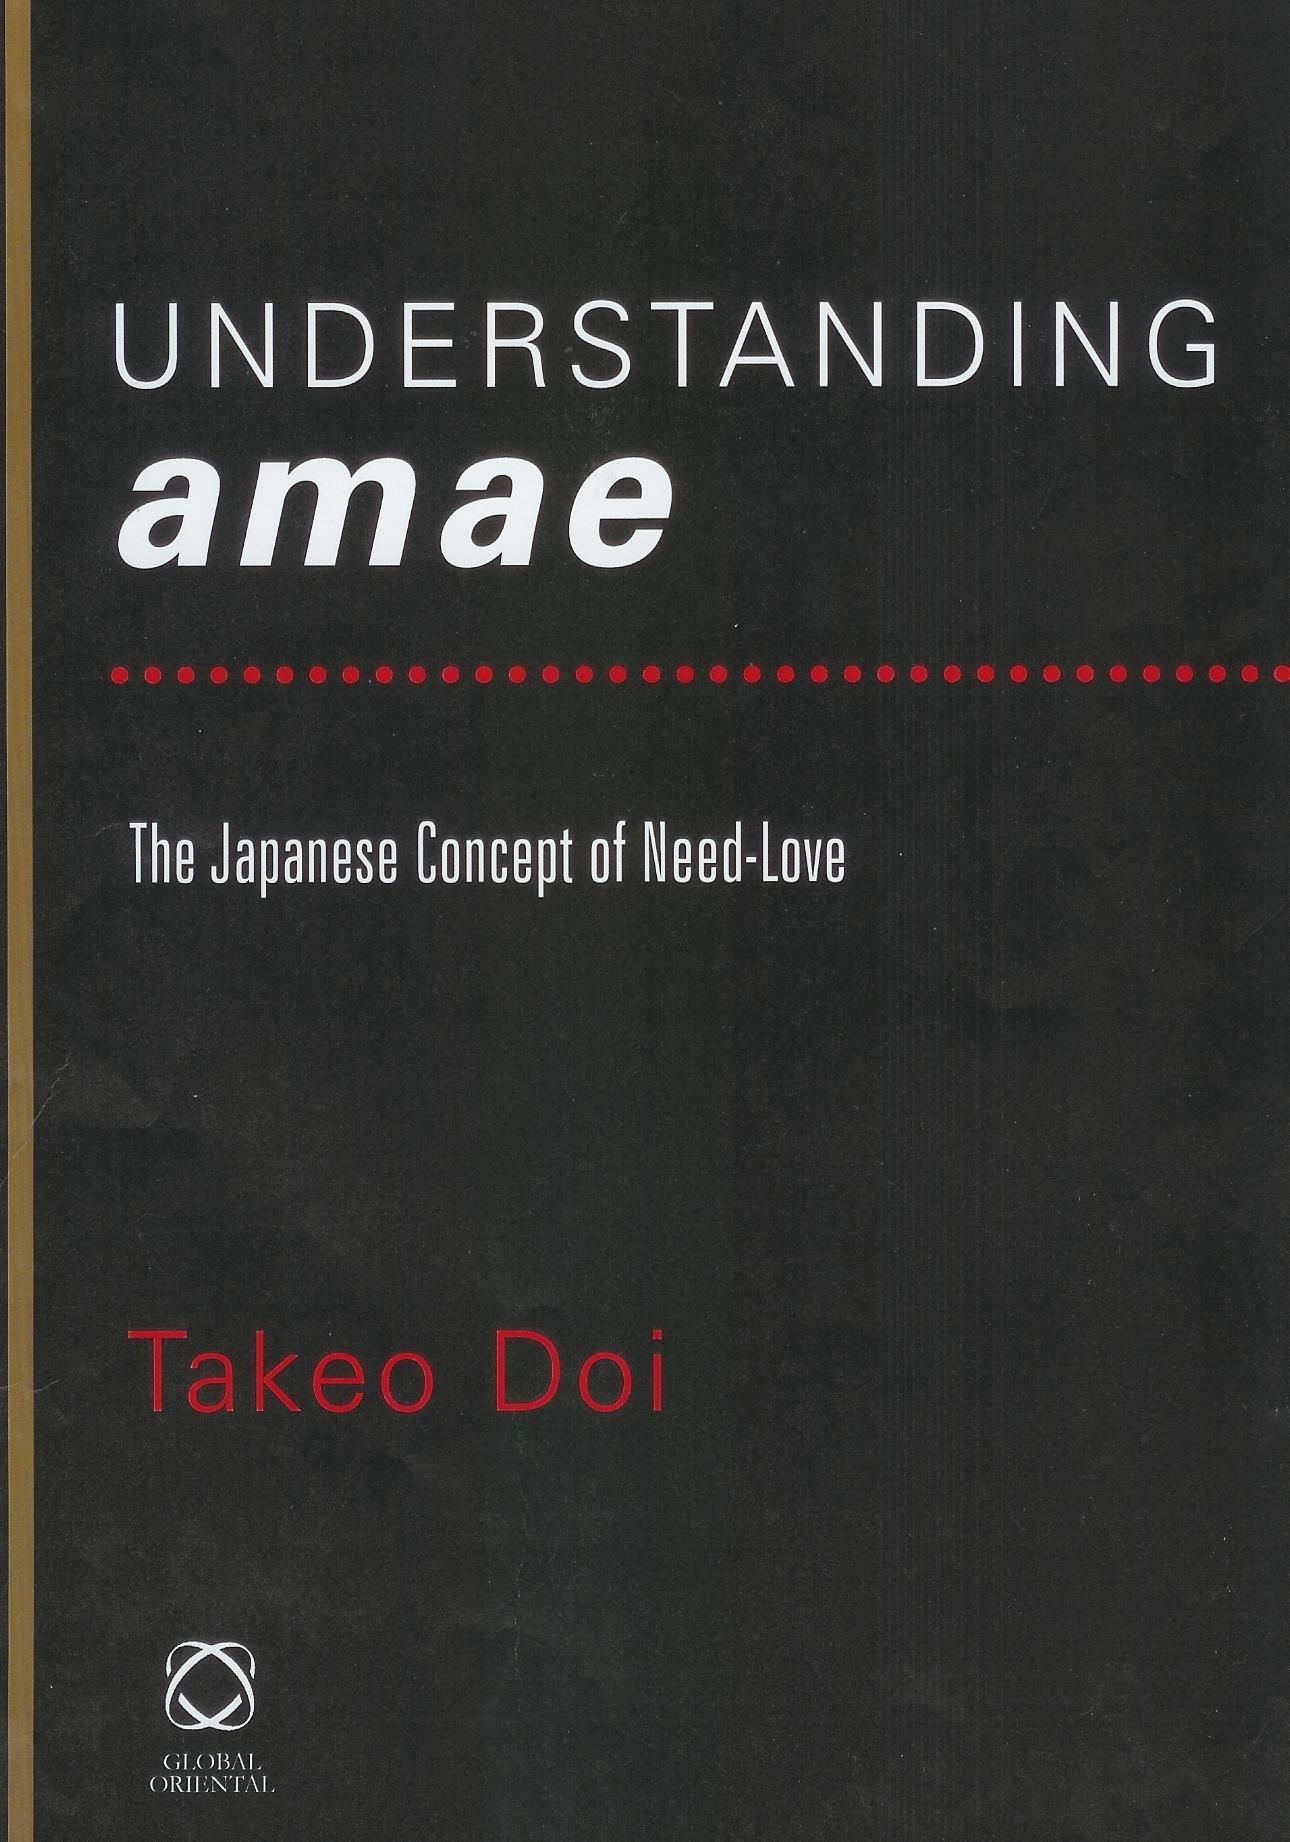 Read Online Understanding Amae (Collected Papers of Twentieth-Century Japanese Writers on Japan) pdf epub